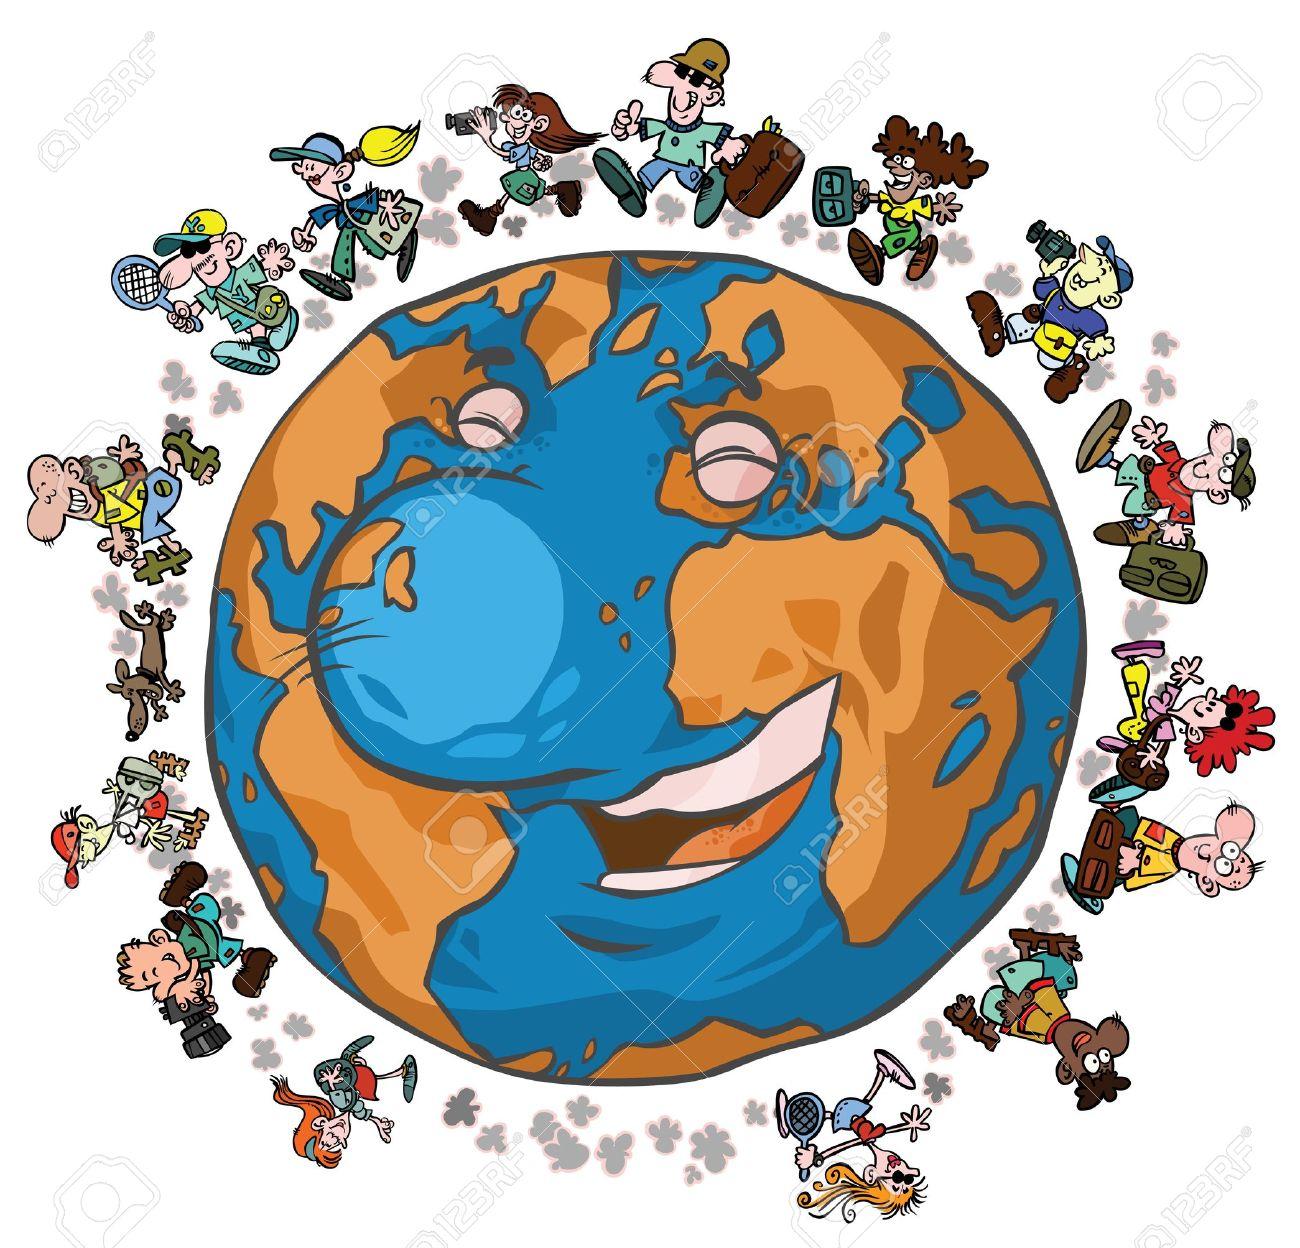 Die erde clipart clip art freeuse Cartoon Erde Mit Globe-Trotters Lizenzfrei Nutzbare Vektorgrafiken ... clip art freeuse